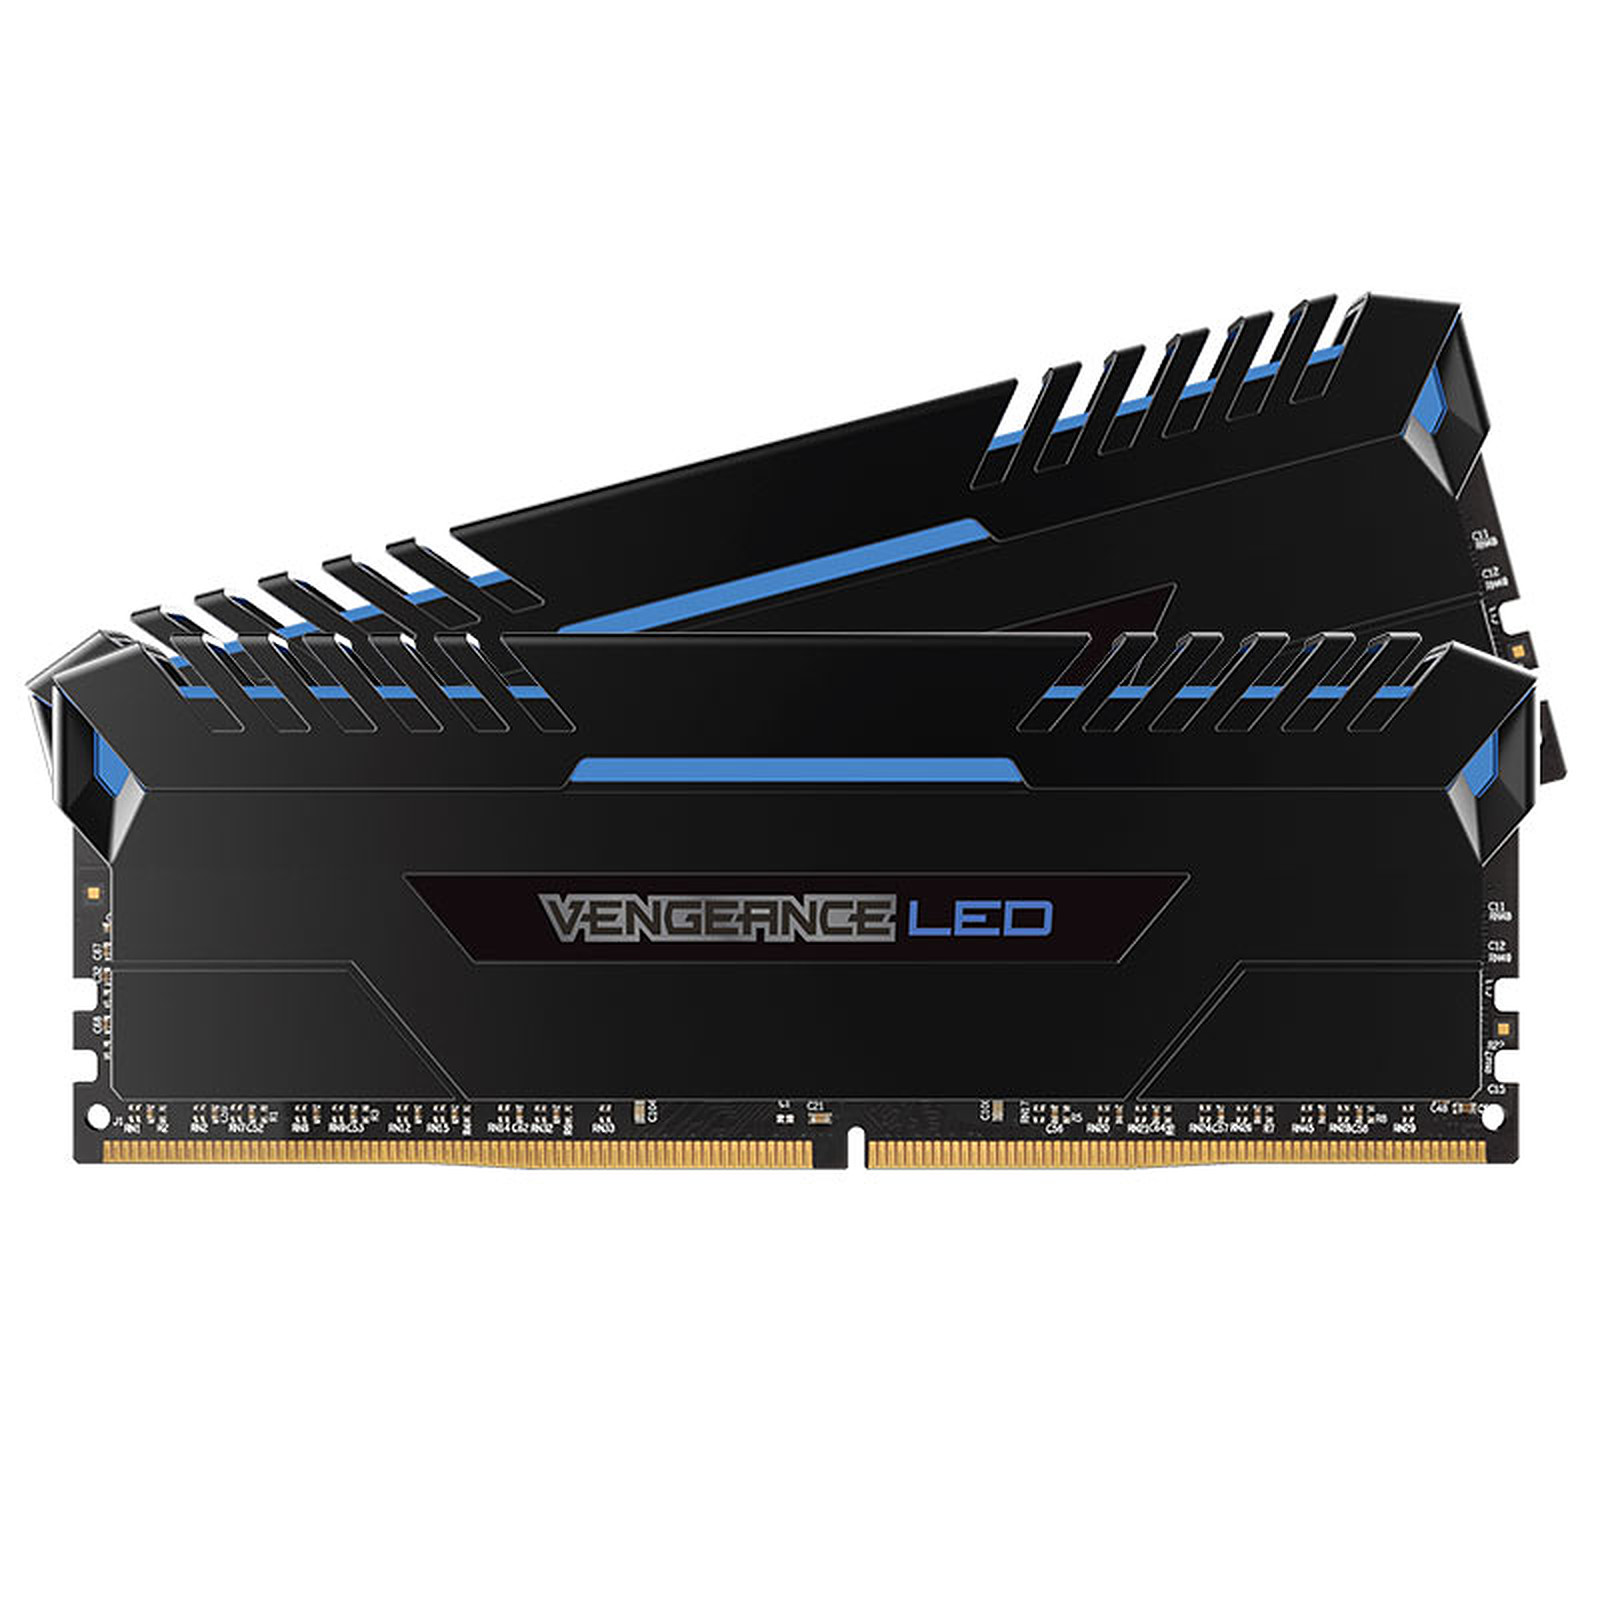 Corsair Vengeance LED Series 16GB (2x 8GB) DDR4 3000 MHz CL16 - Azul